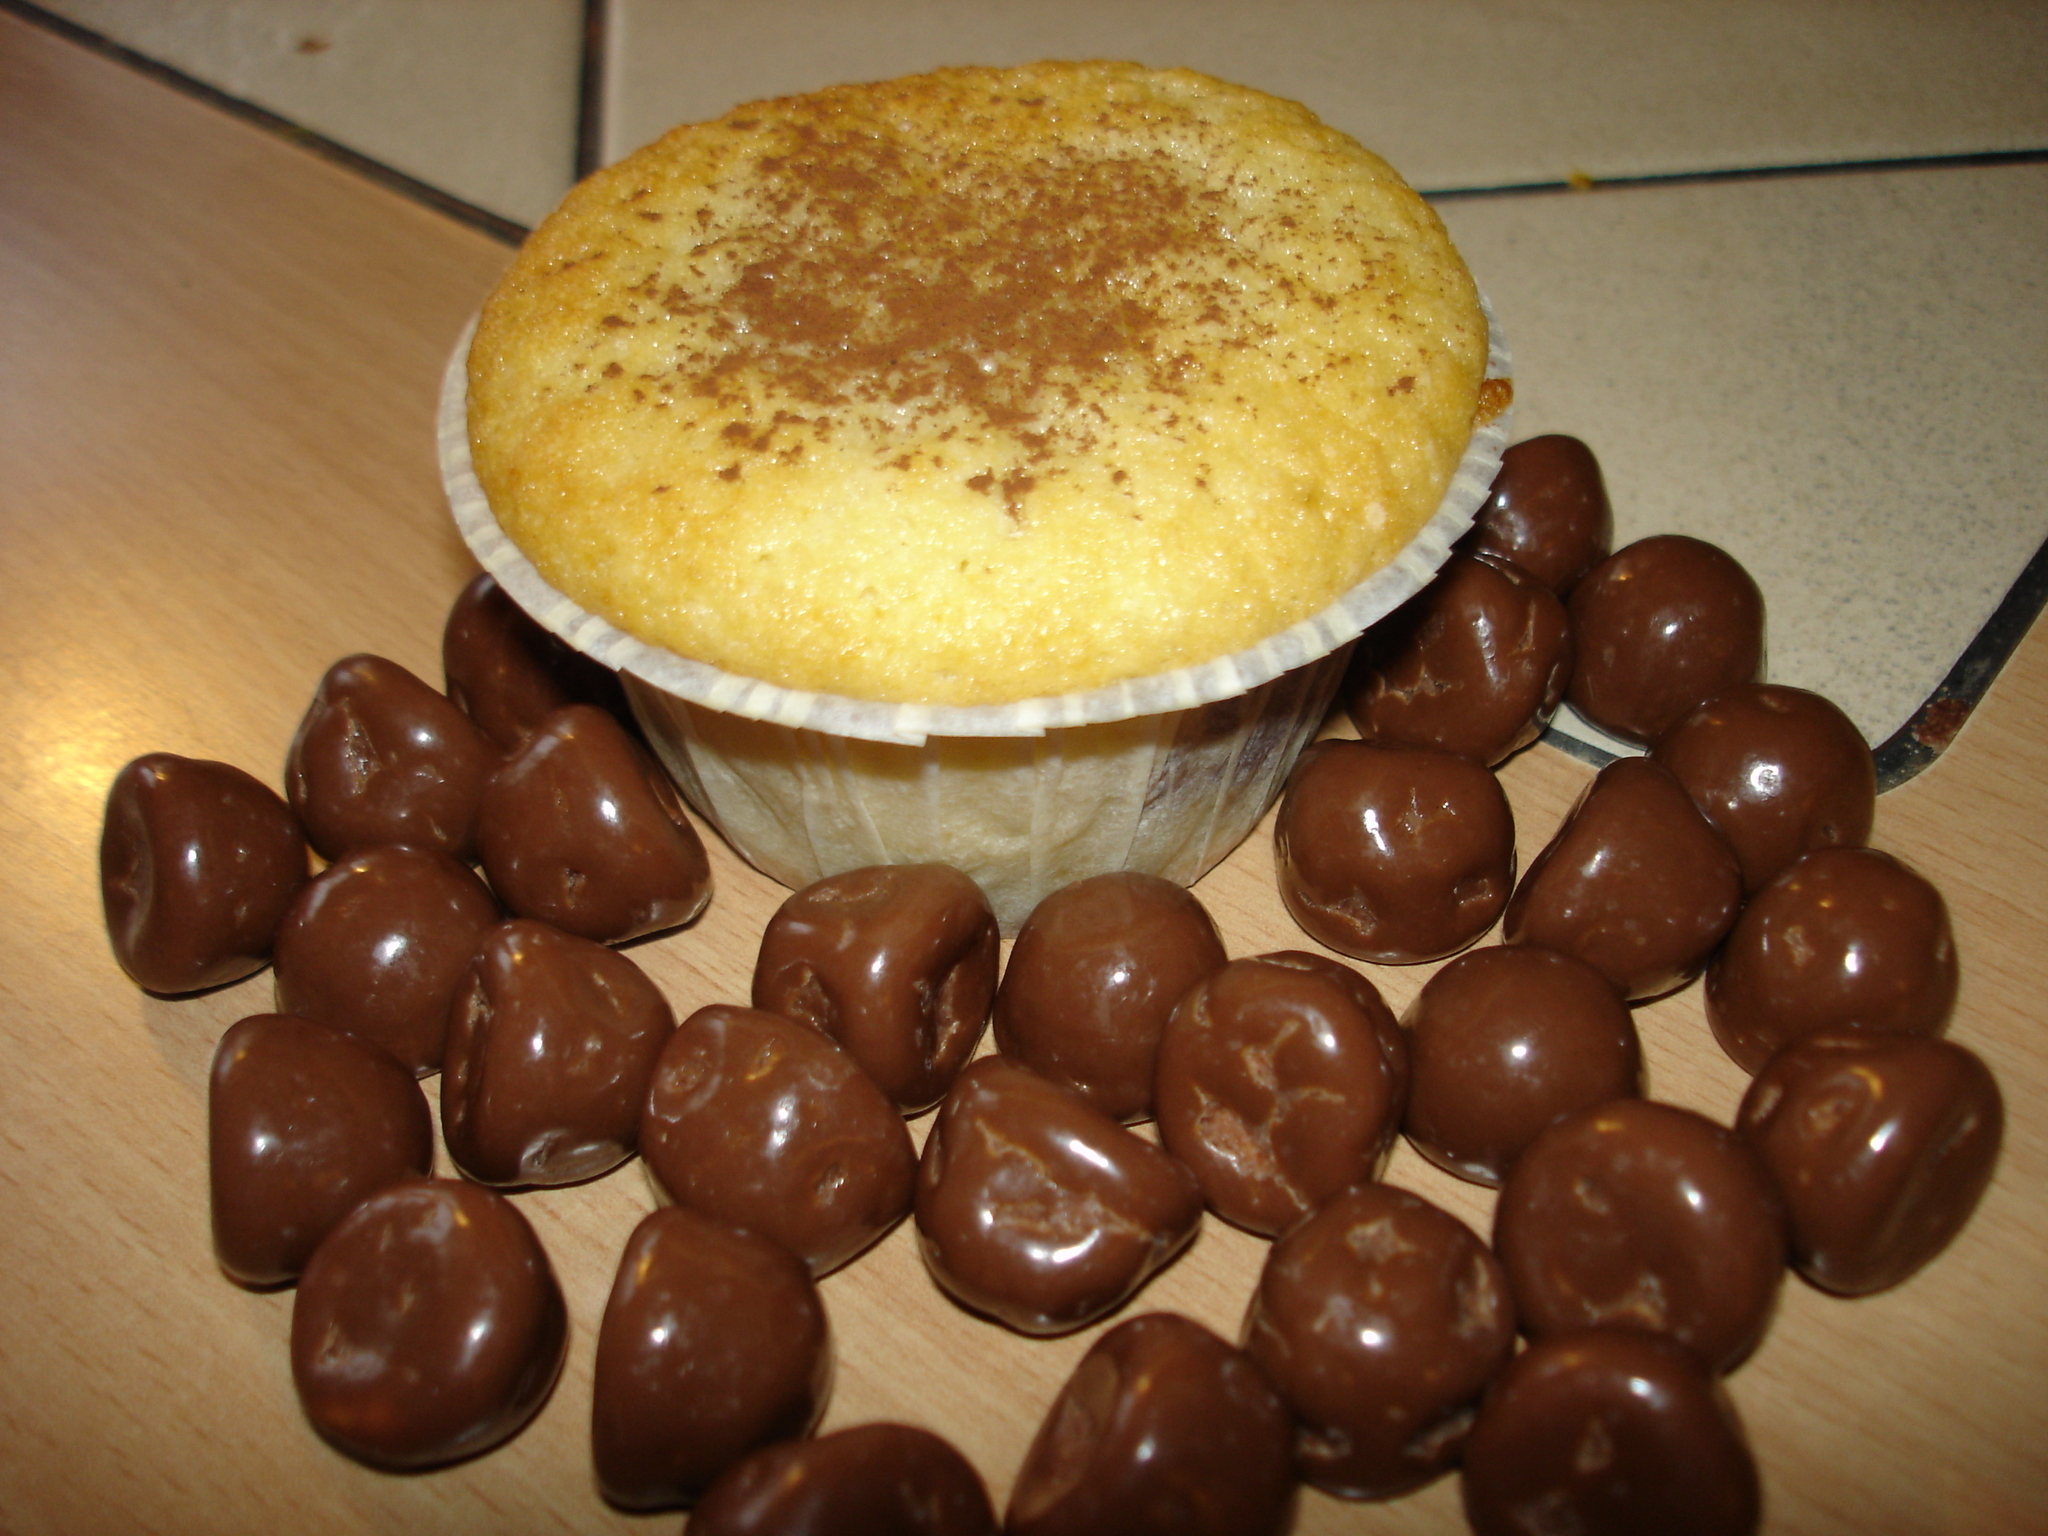 lätta muffins i muffinsmaskin